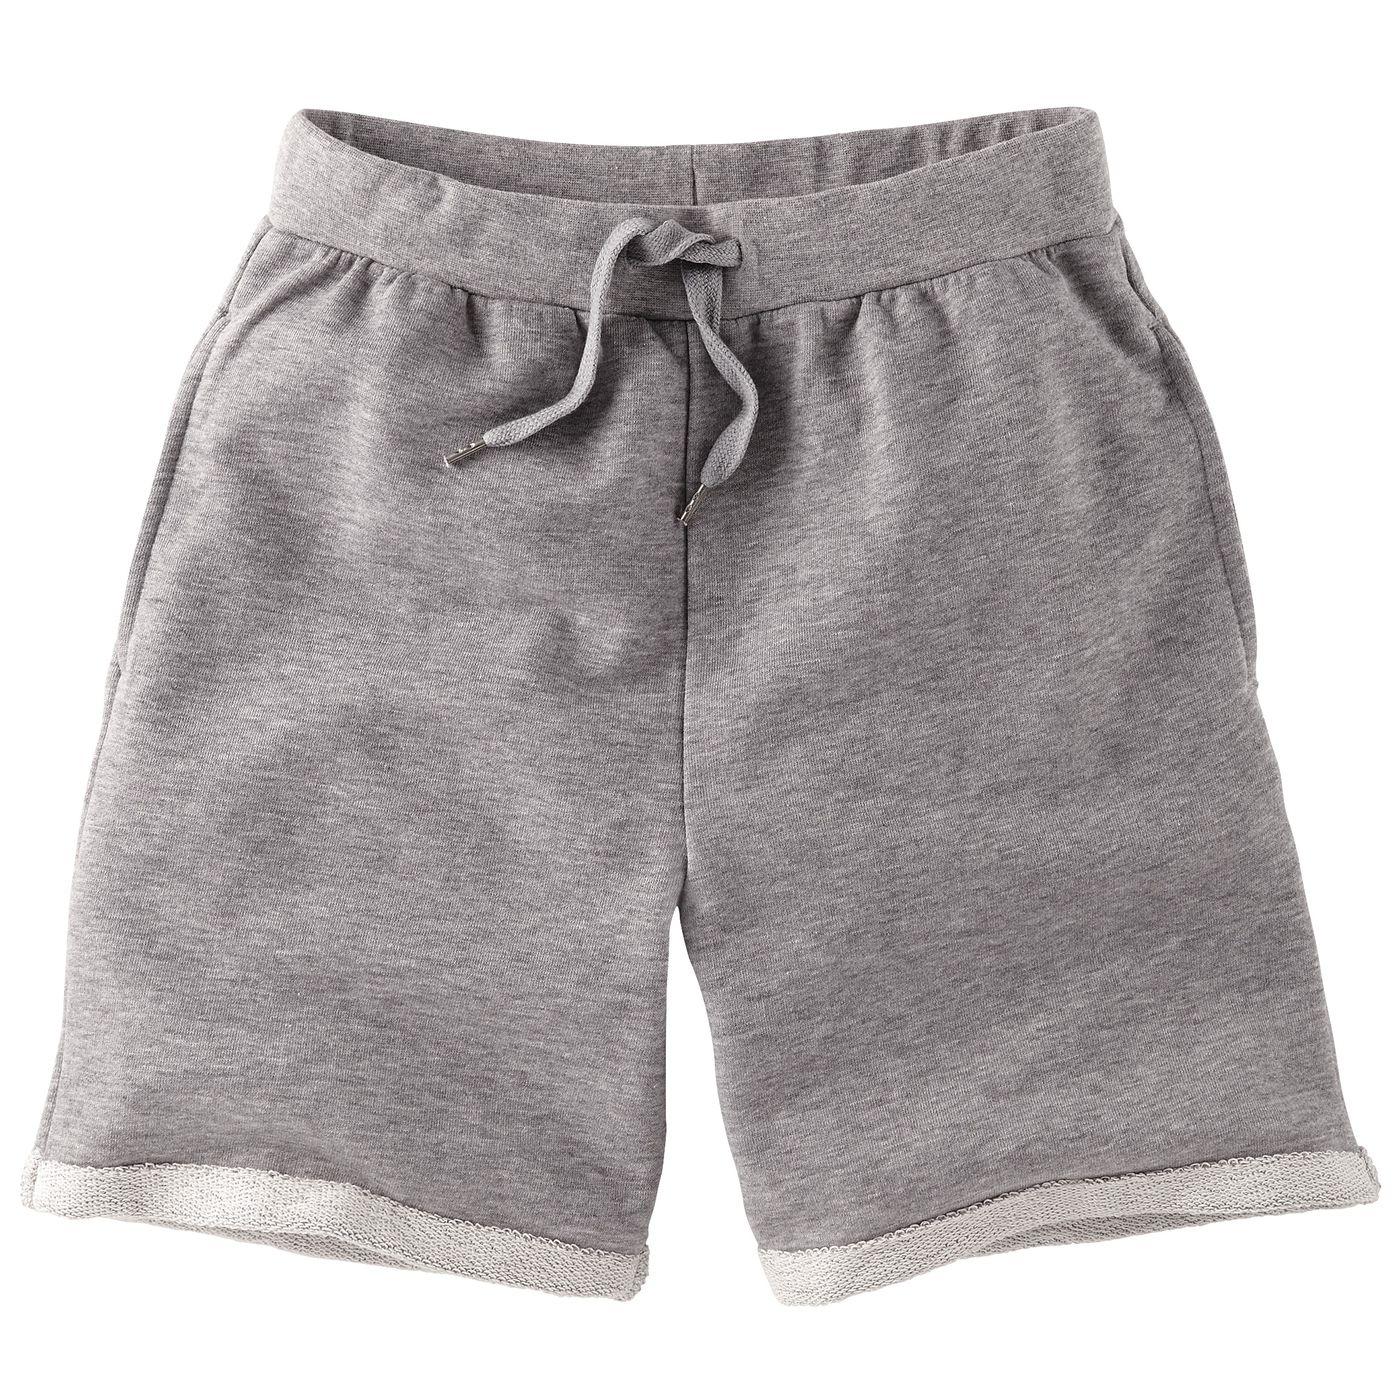 Мальчики пот брюки FIT‑Z